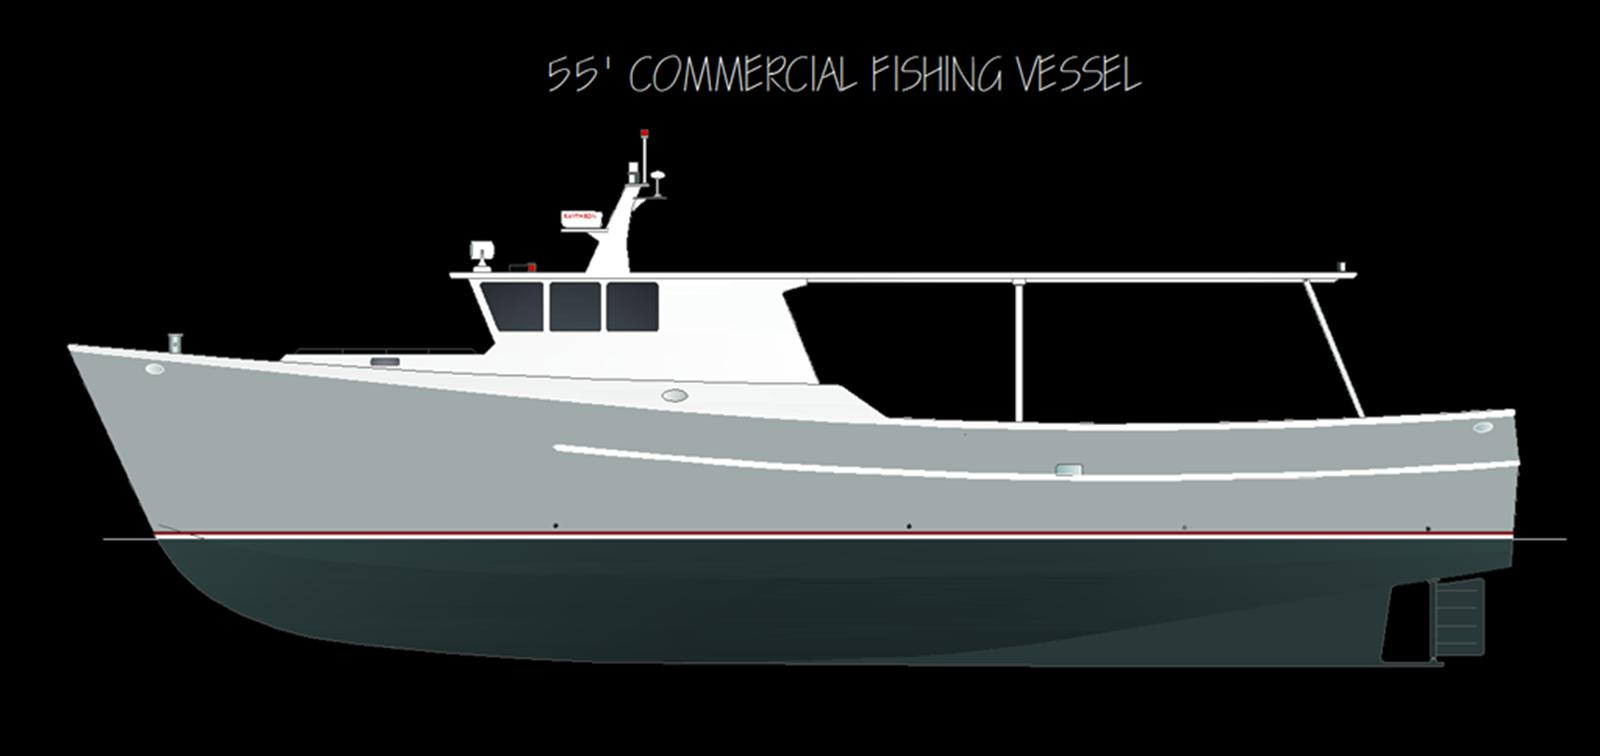 55' Commercial Fishing Vessel Design | Boat Design Net